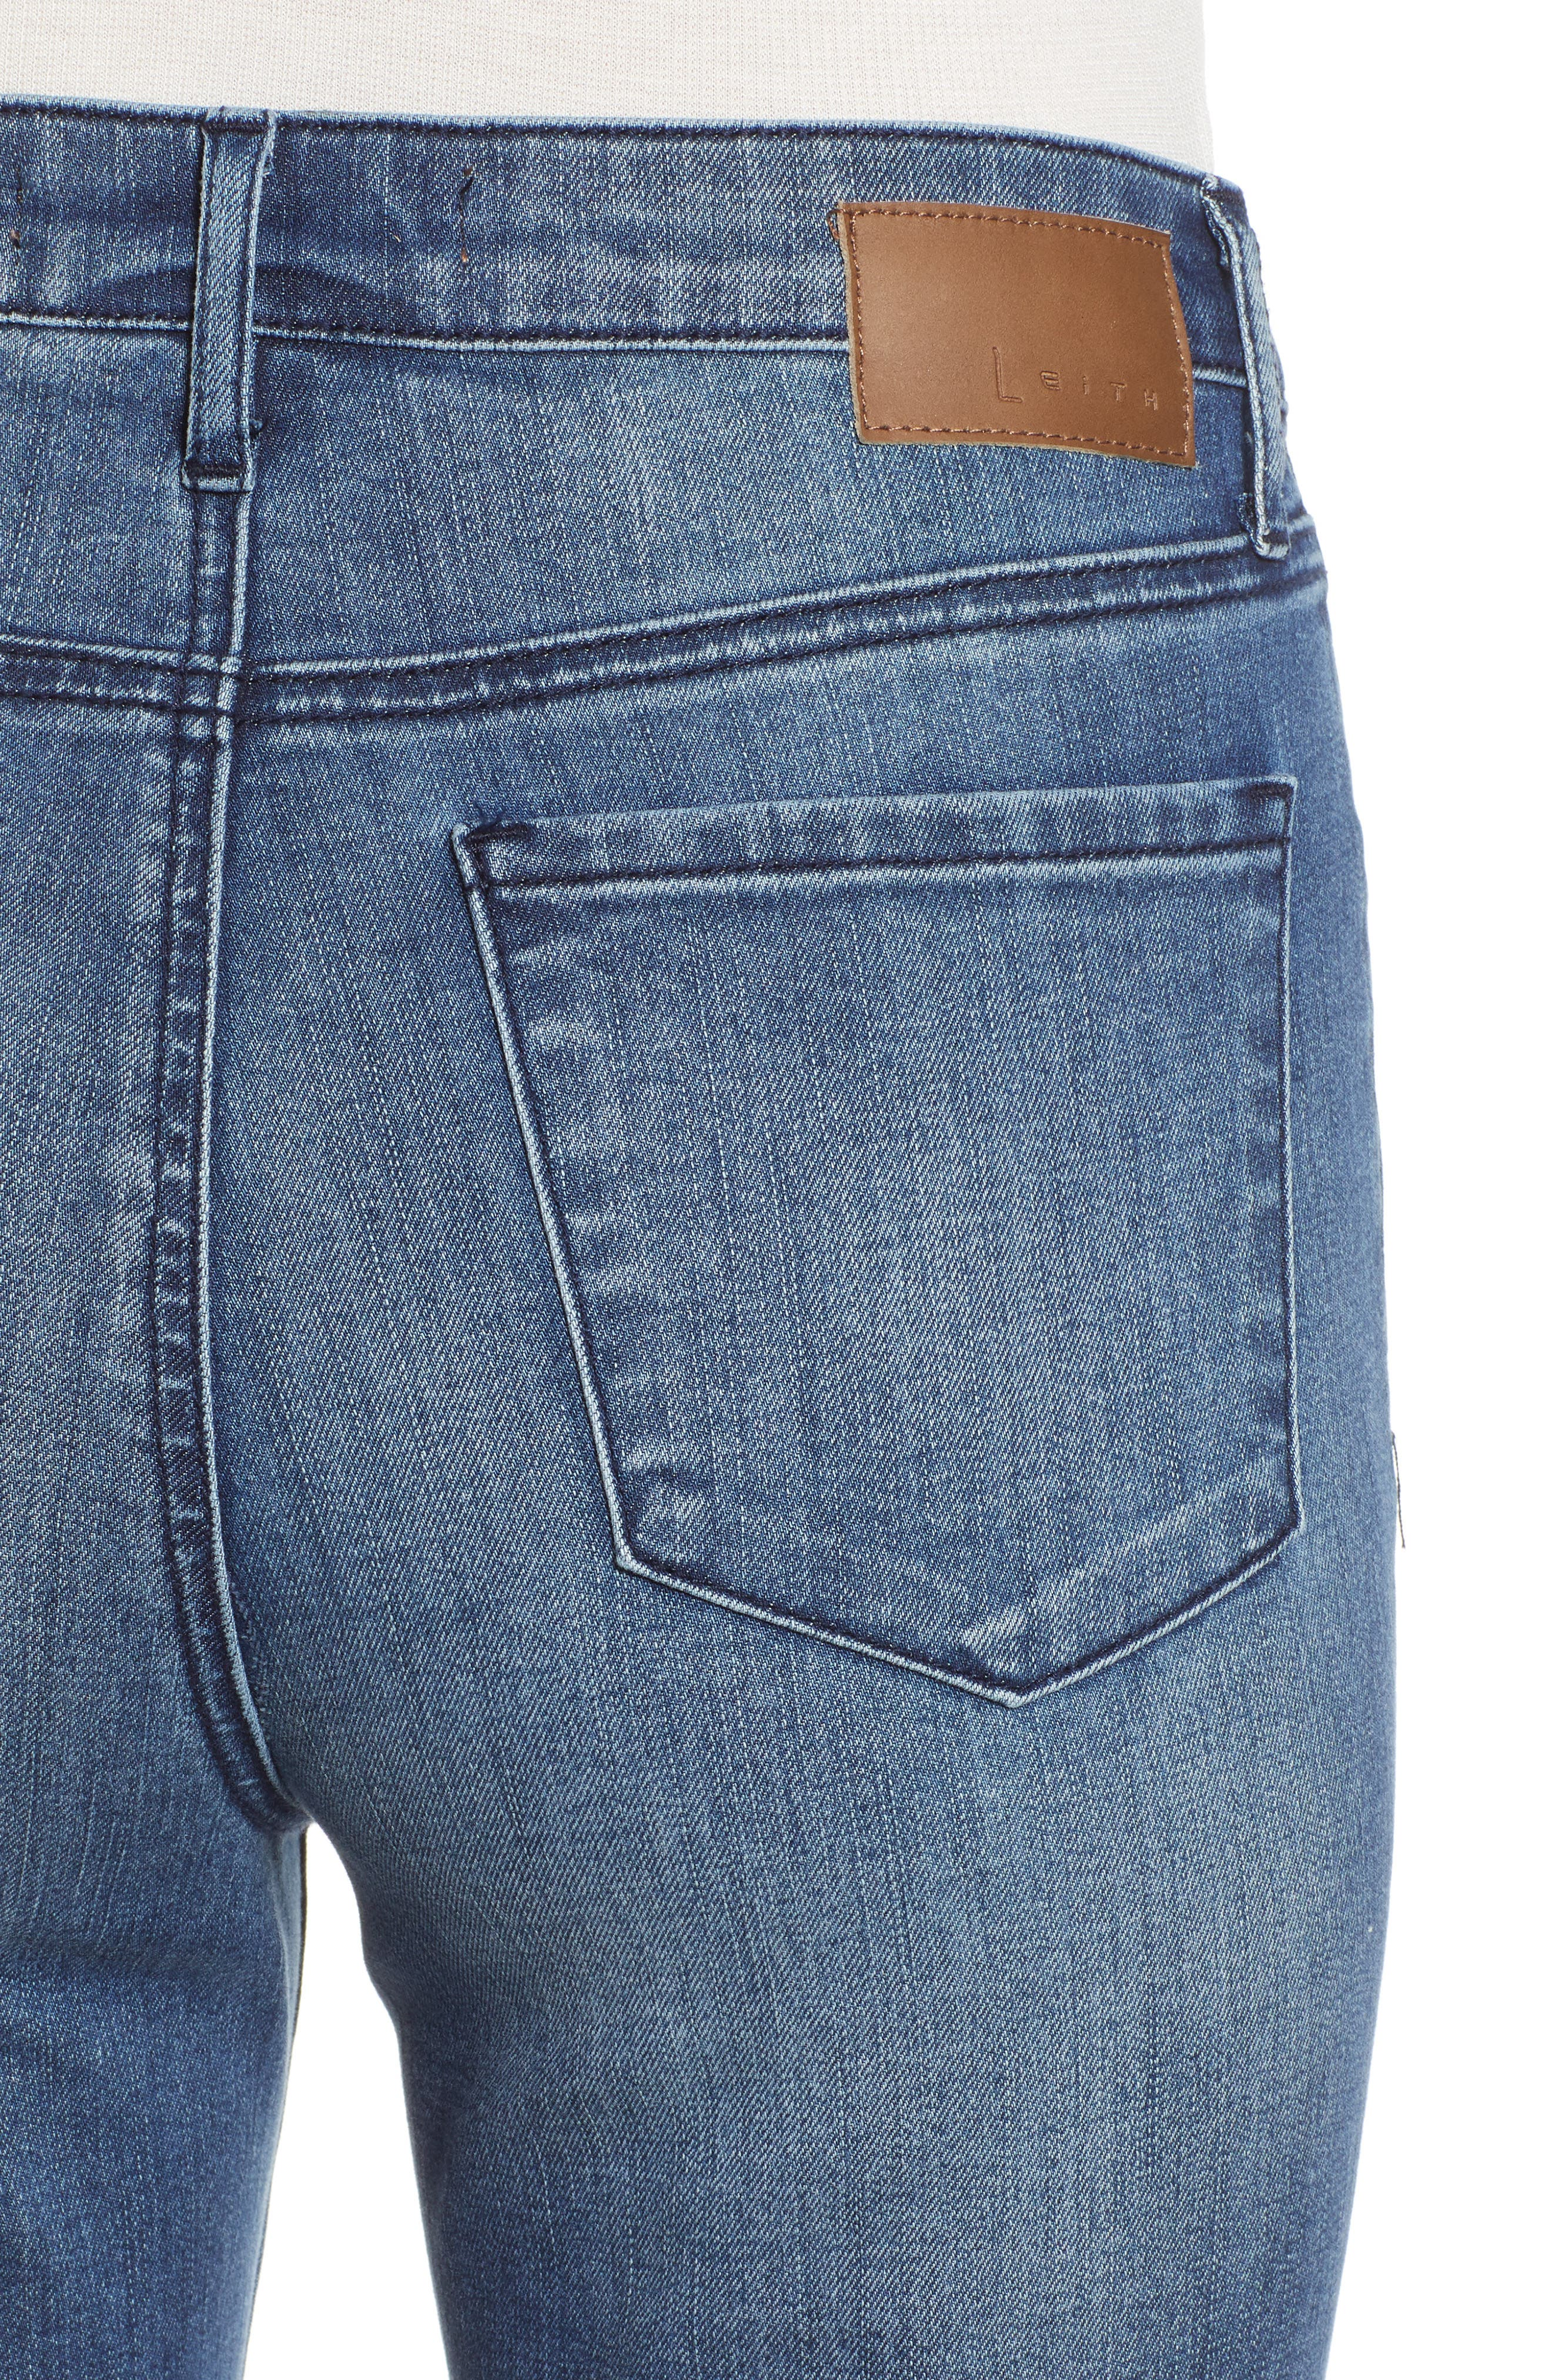 LEITH, High Waist Flare Jeans, Alternate thumbnail 5, color, MEDIUM WASH